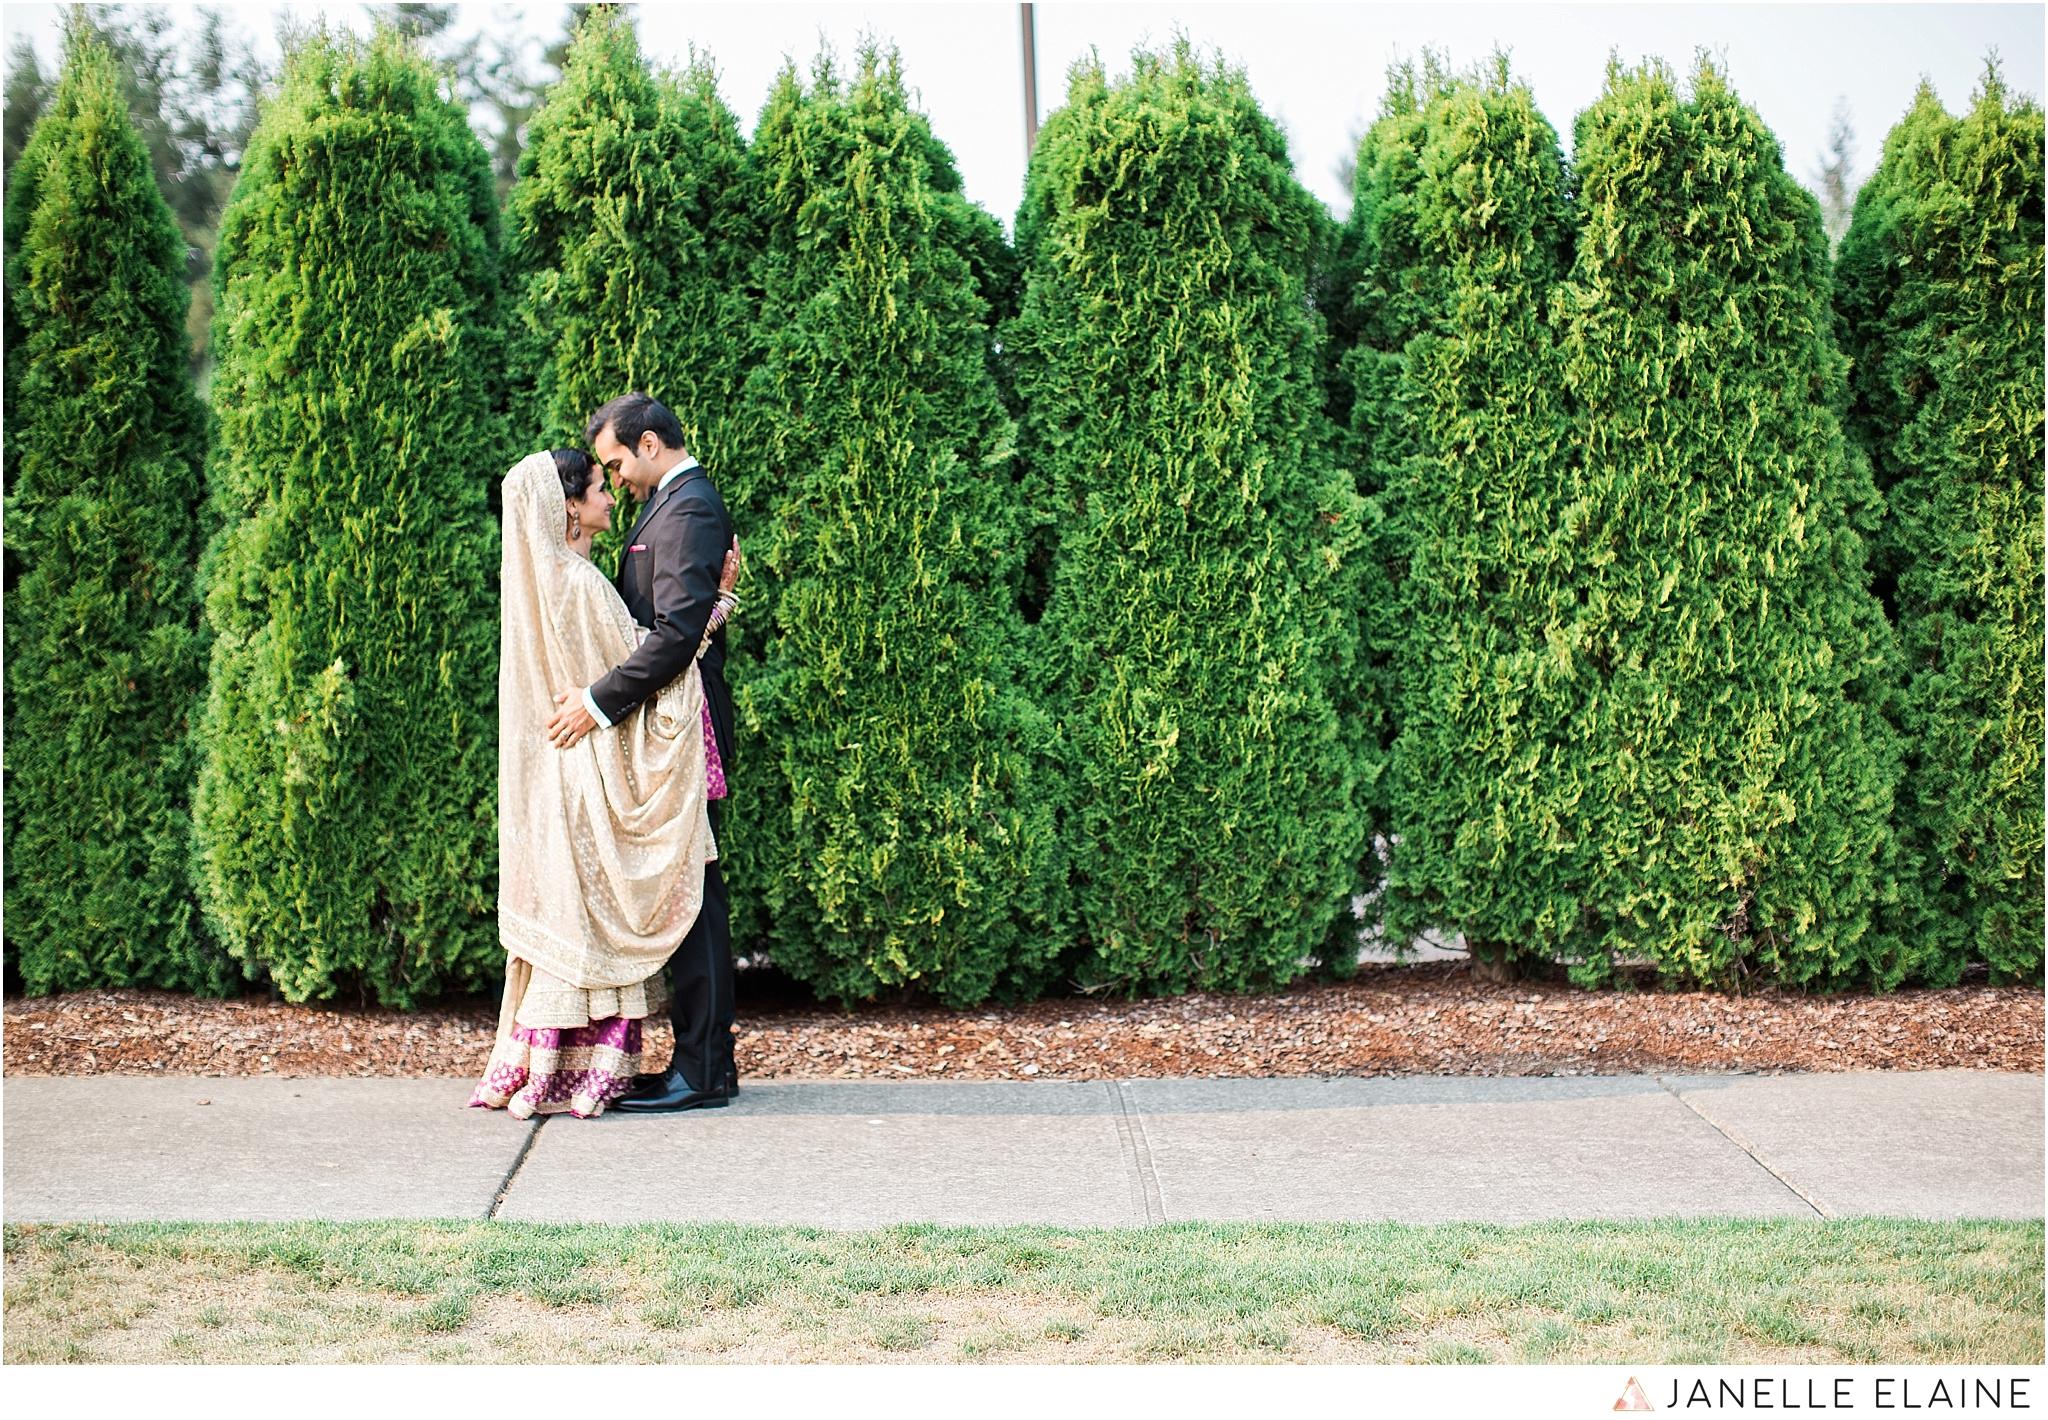 janelle elaine photography-the club at snoqualmie ridge-washington-wedding-photography-portraits-81.jpg